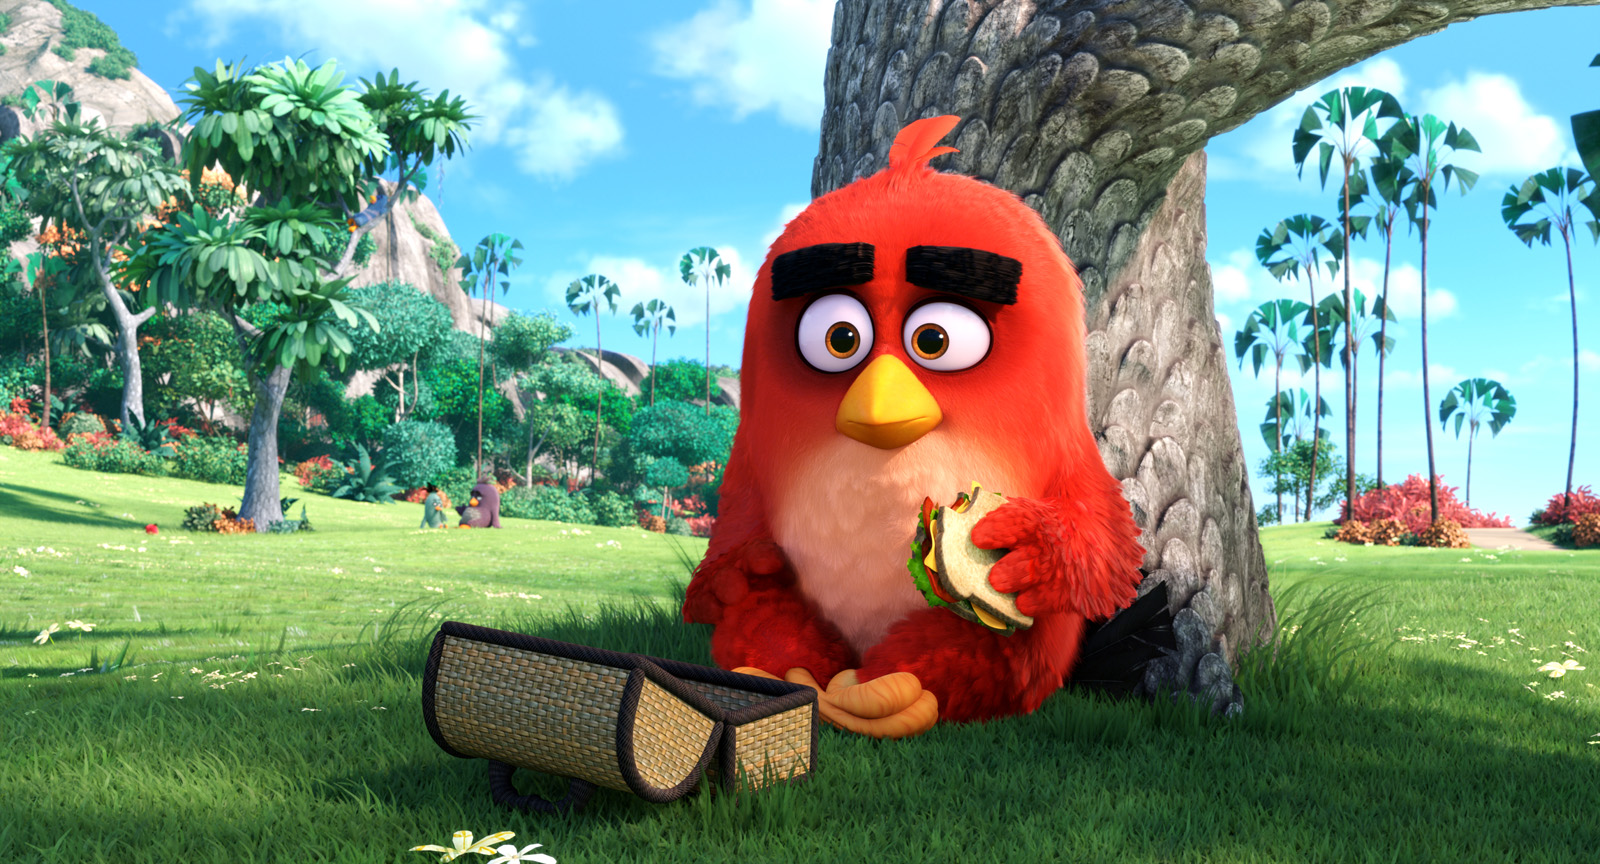 Angry-Birds-Film-Image-1